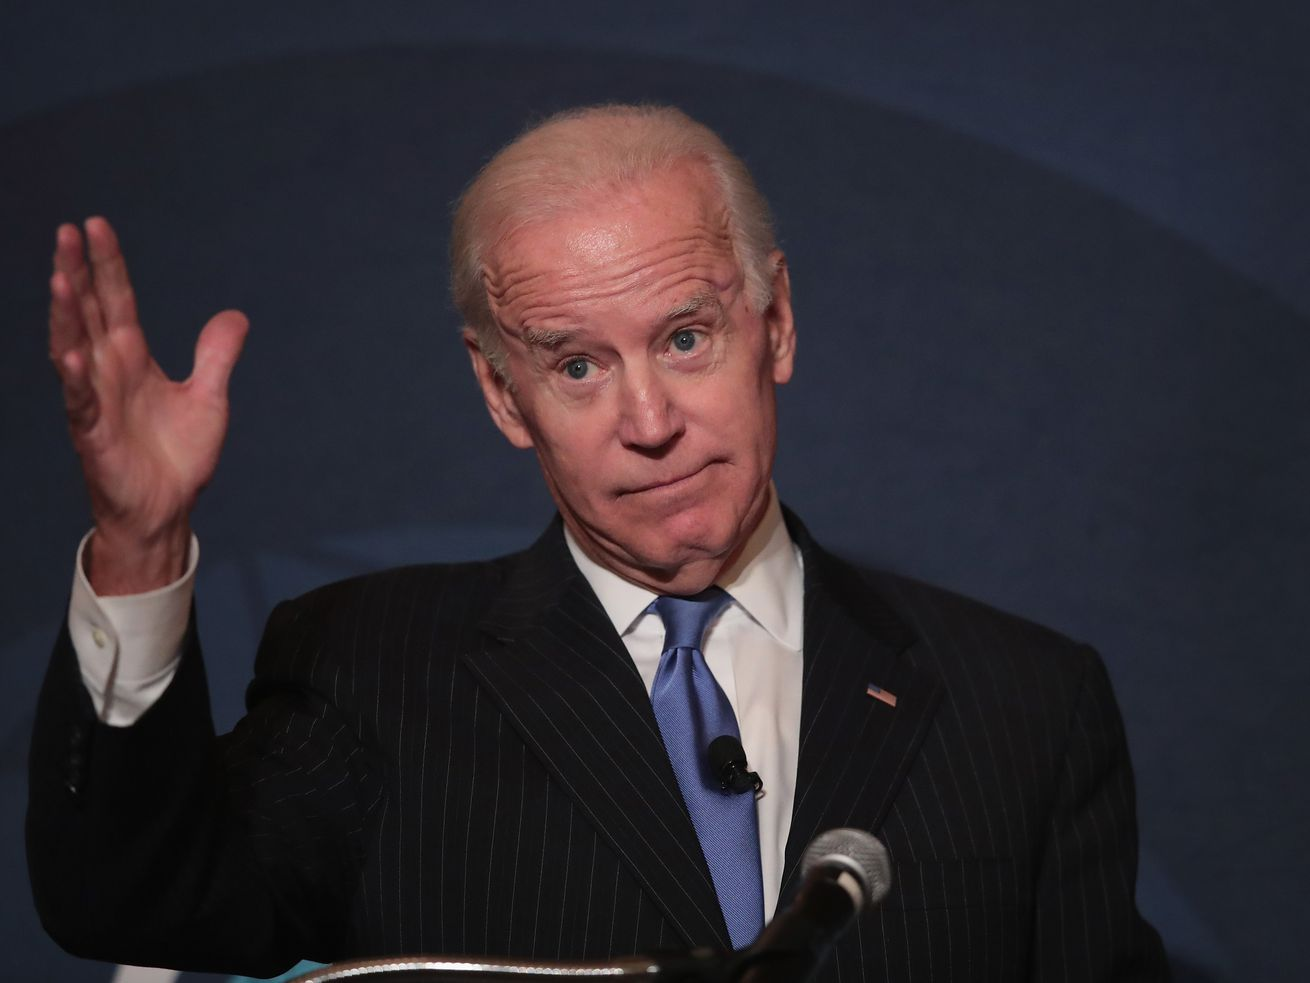 Former Vice President Joe Biden speaks to the Chicago Council on Global Affairs on November 1, 2017.